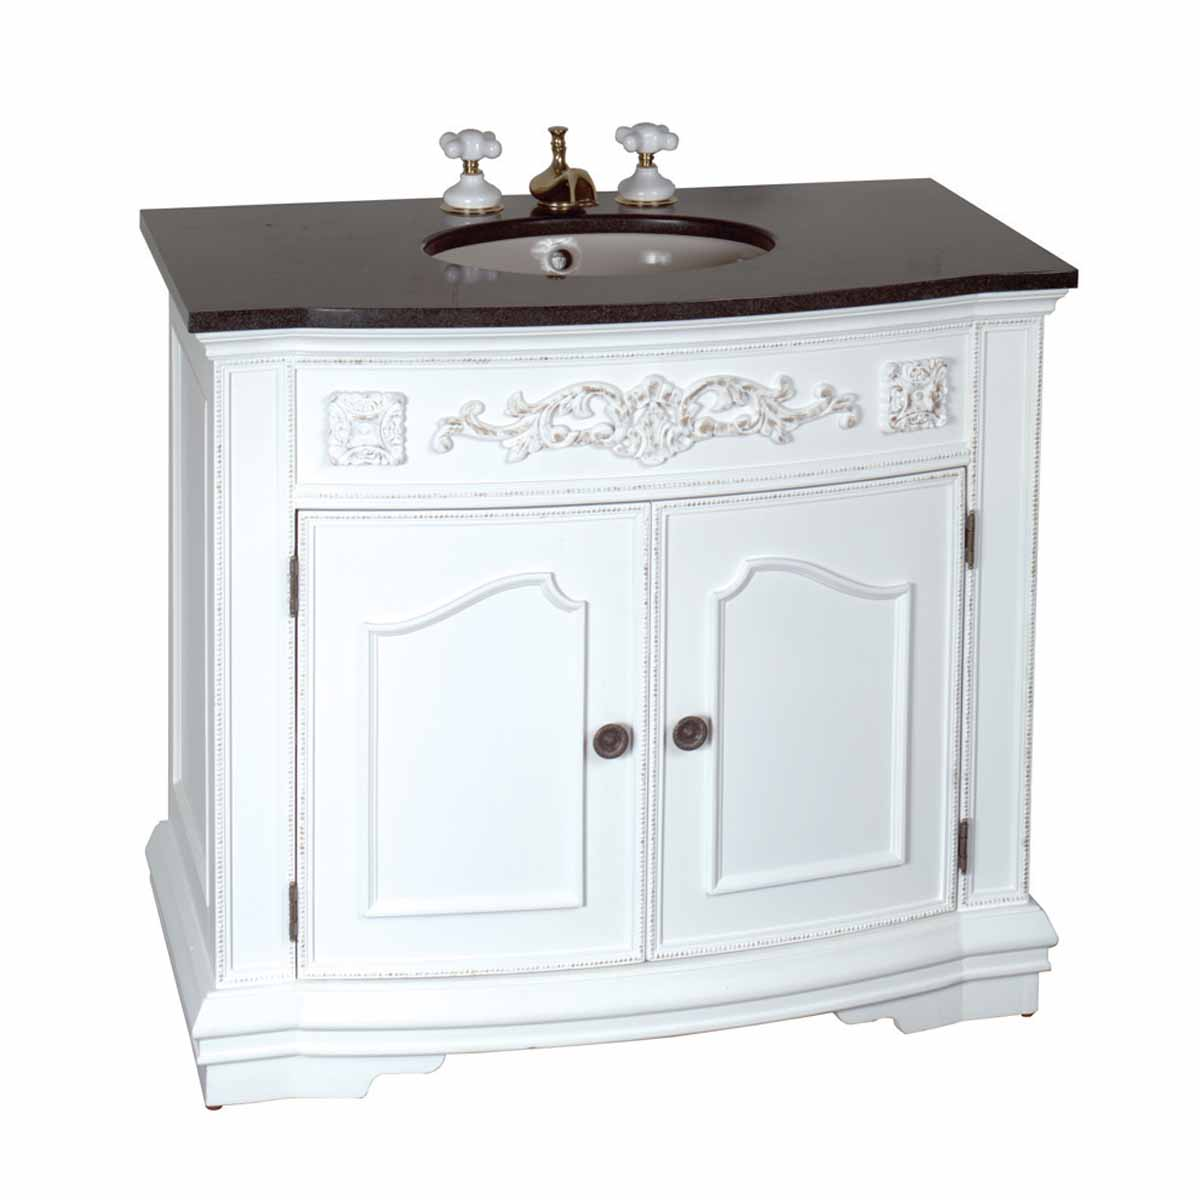 37 inch Bathroom Vanity Sink and Cabinet Marble Top